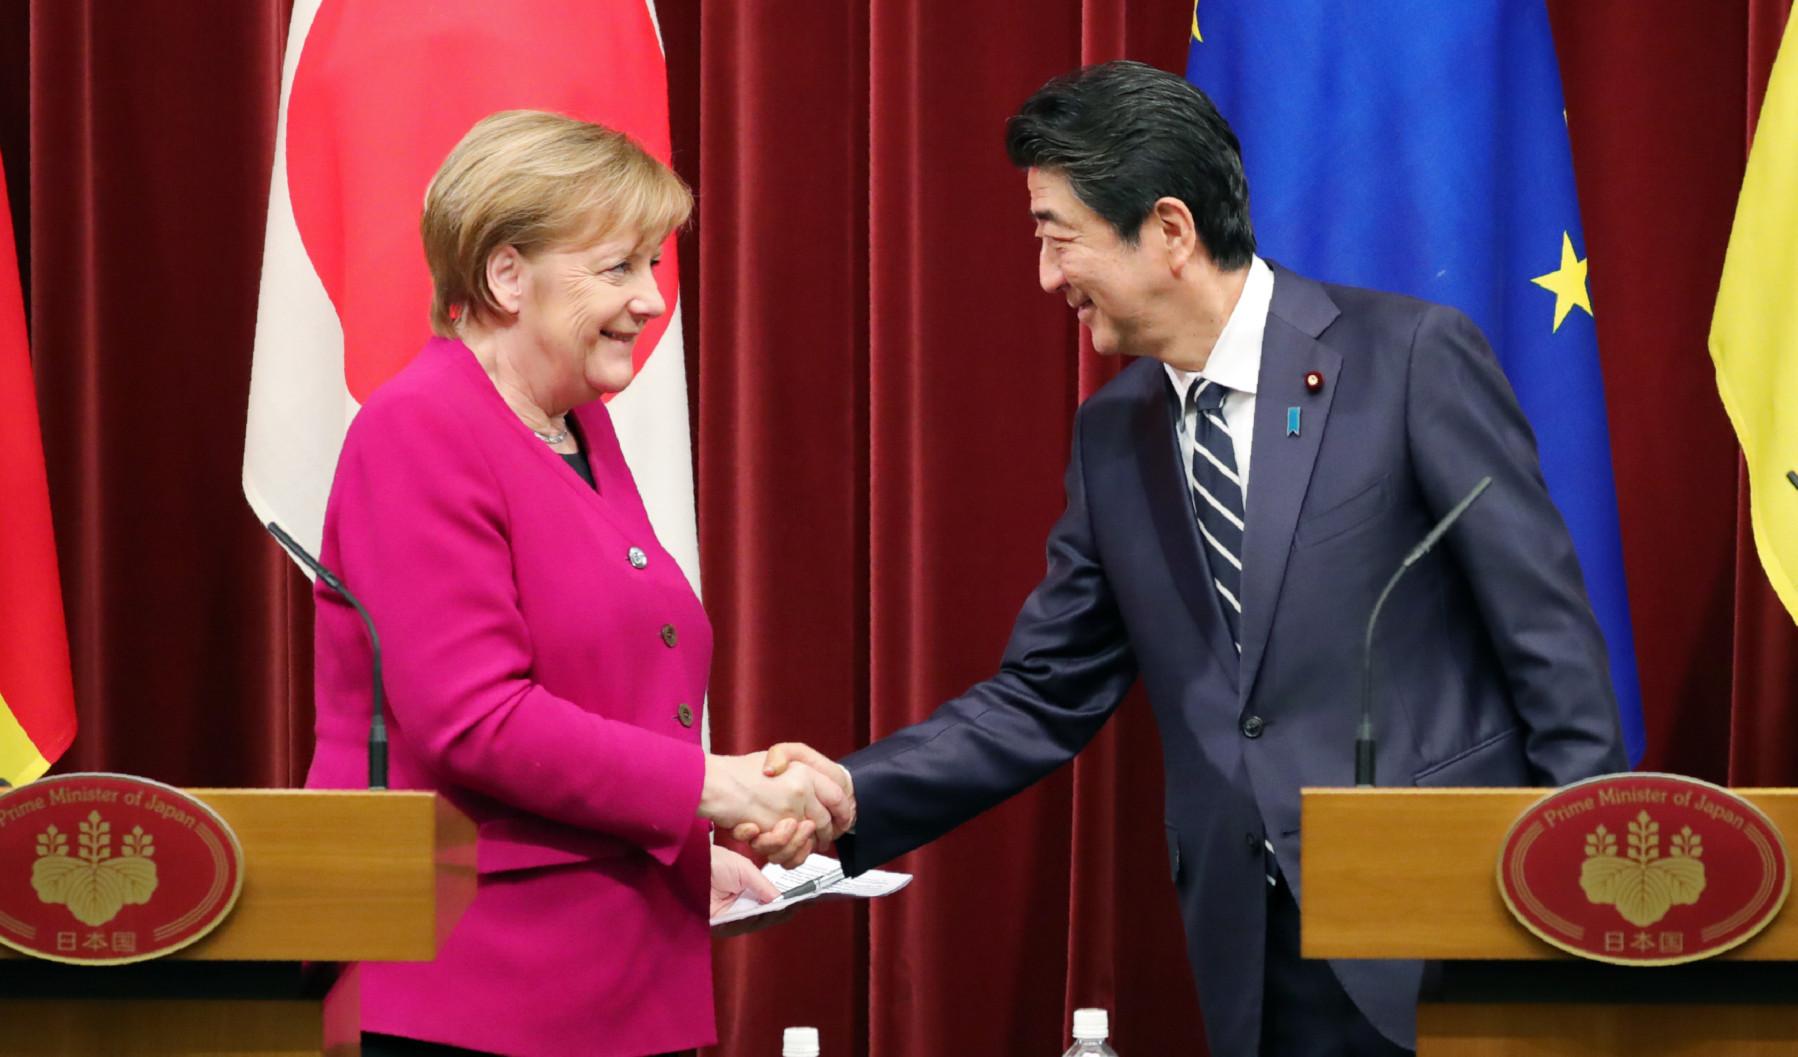 Merkel courts Abe as Berlin rethinks China-centric stance - Nikkei Asia